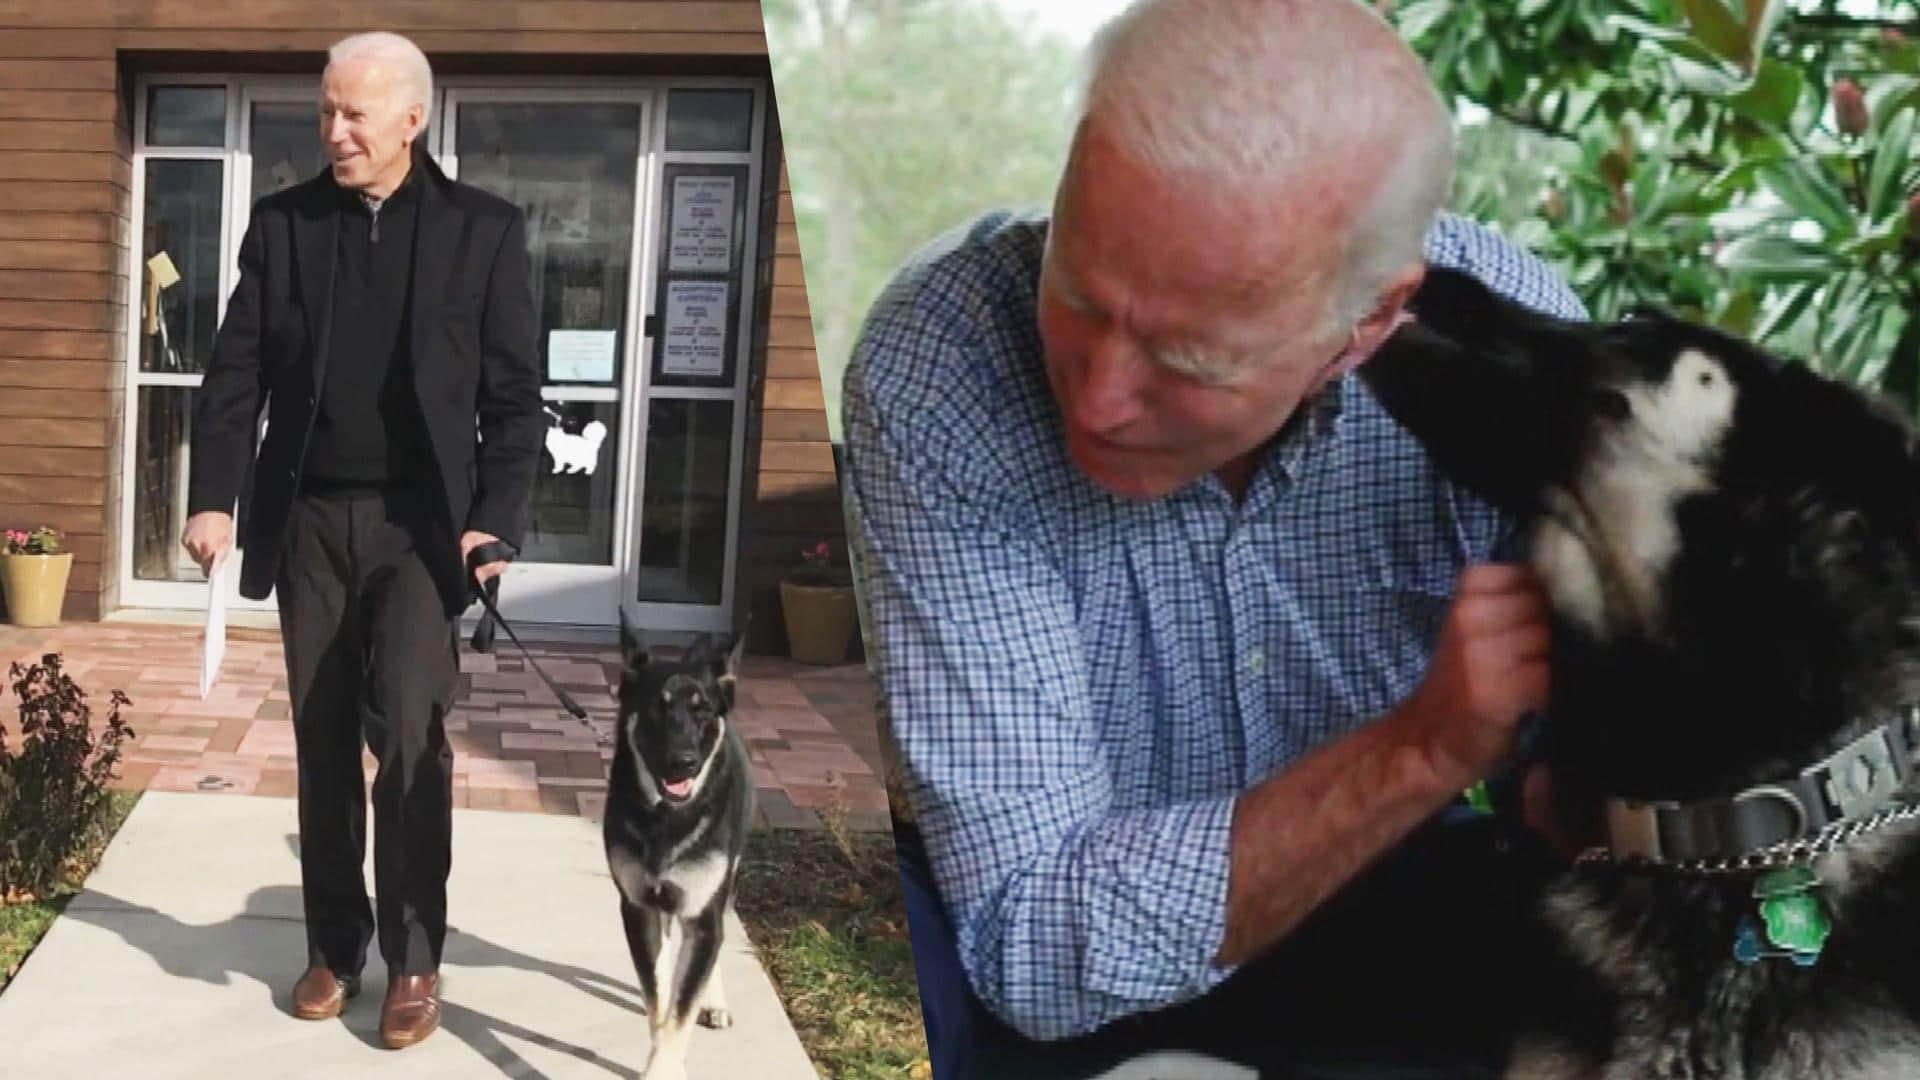 عمره 13 عاماً .. وفاة كلب بايدن والرئيس: نحبه وسوف نفتقده دائما (شاهد)